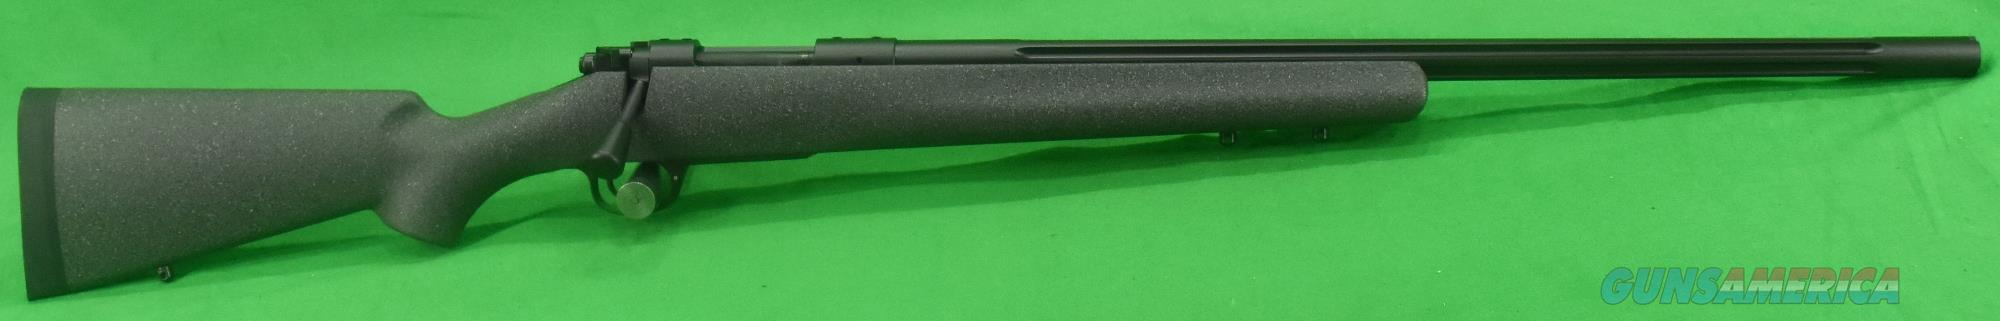 84M Open Country Granite 308 Win TB 3000860  Guns > Rifles > Kimber of America Rifles